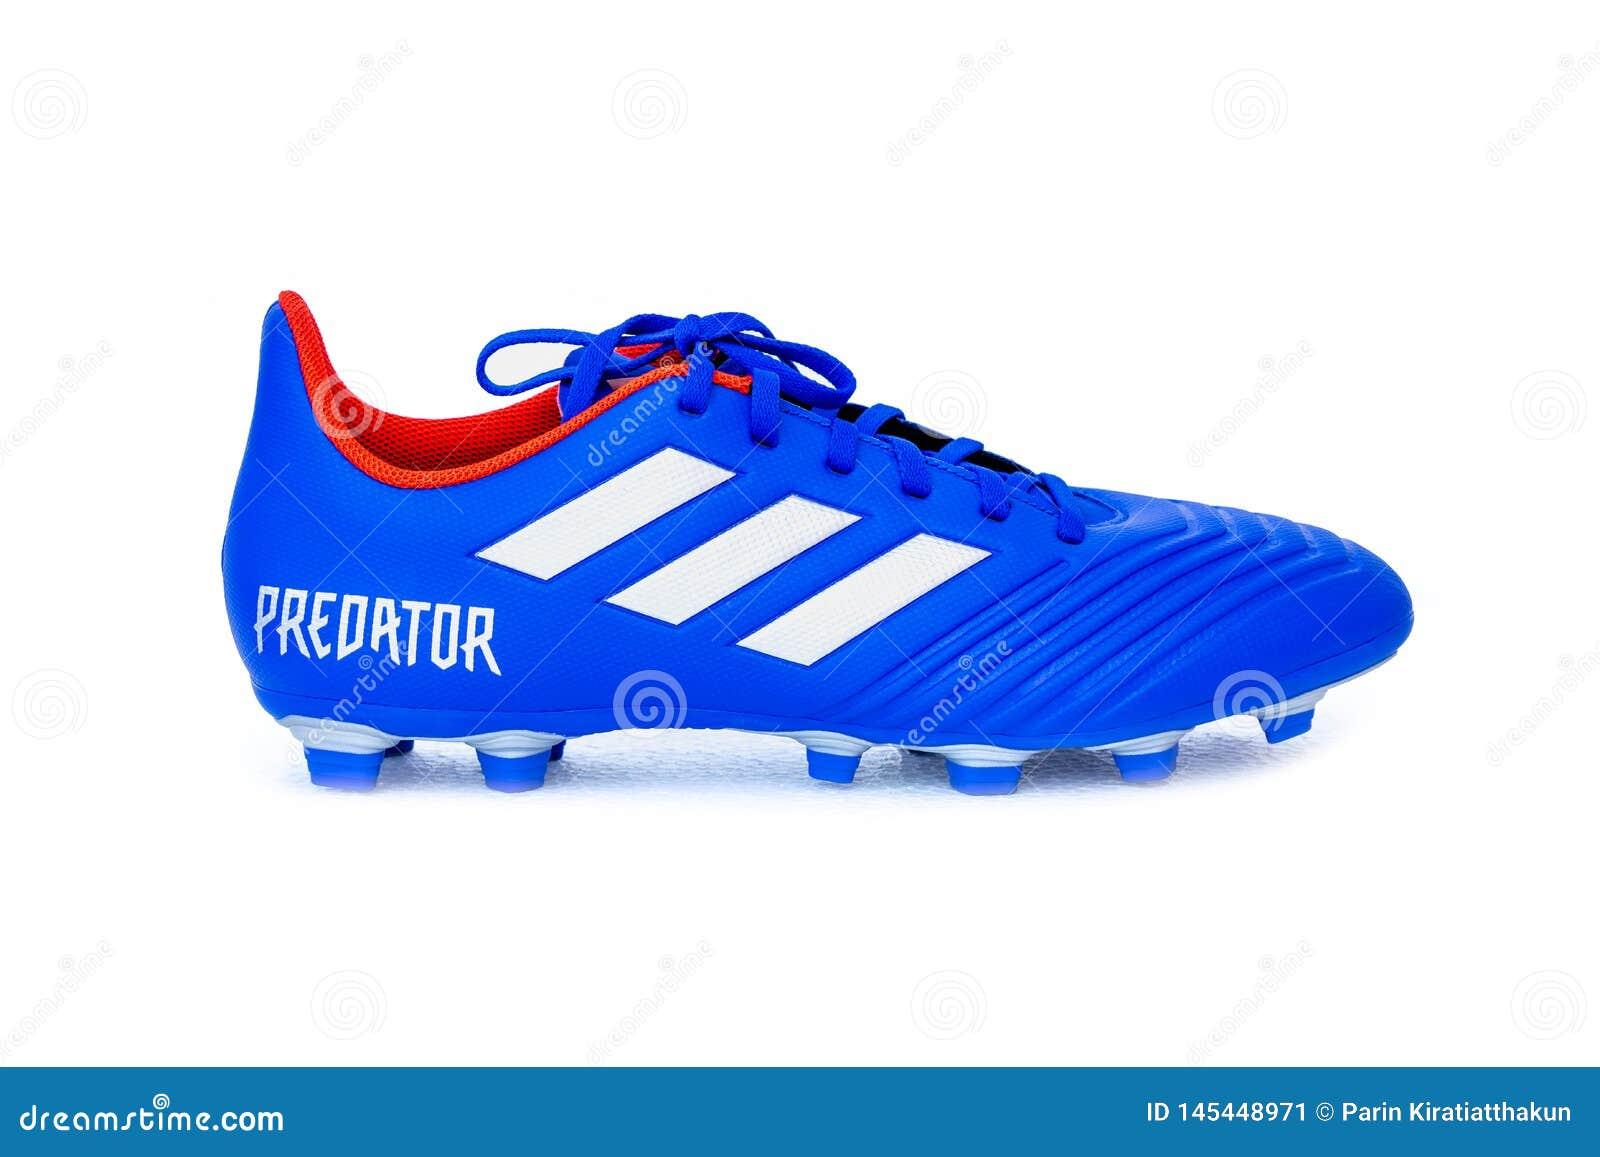 predator boots 2019